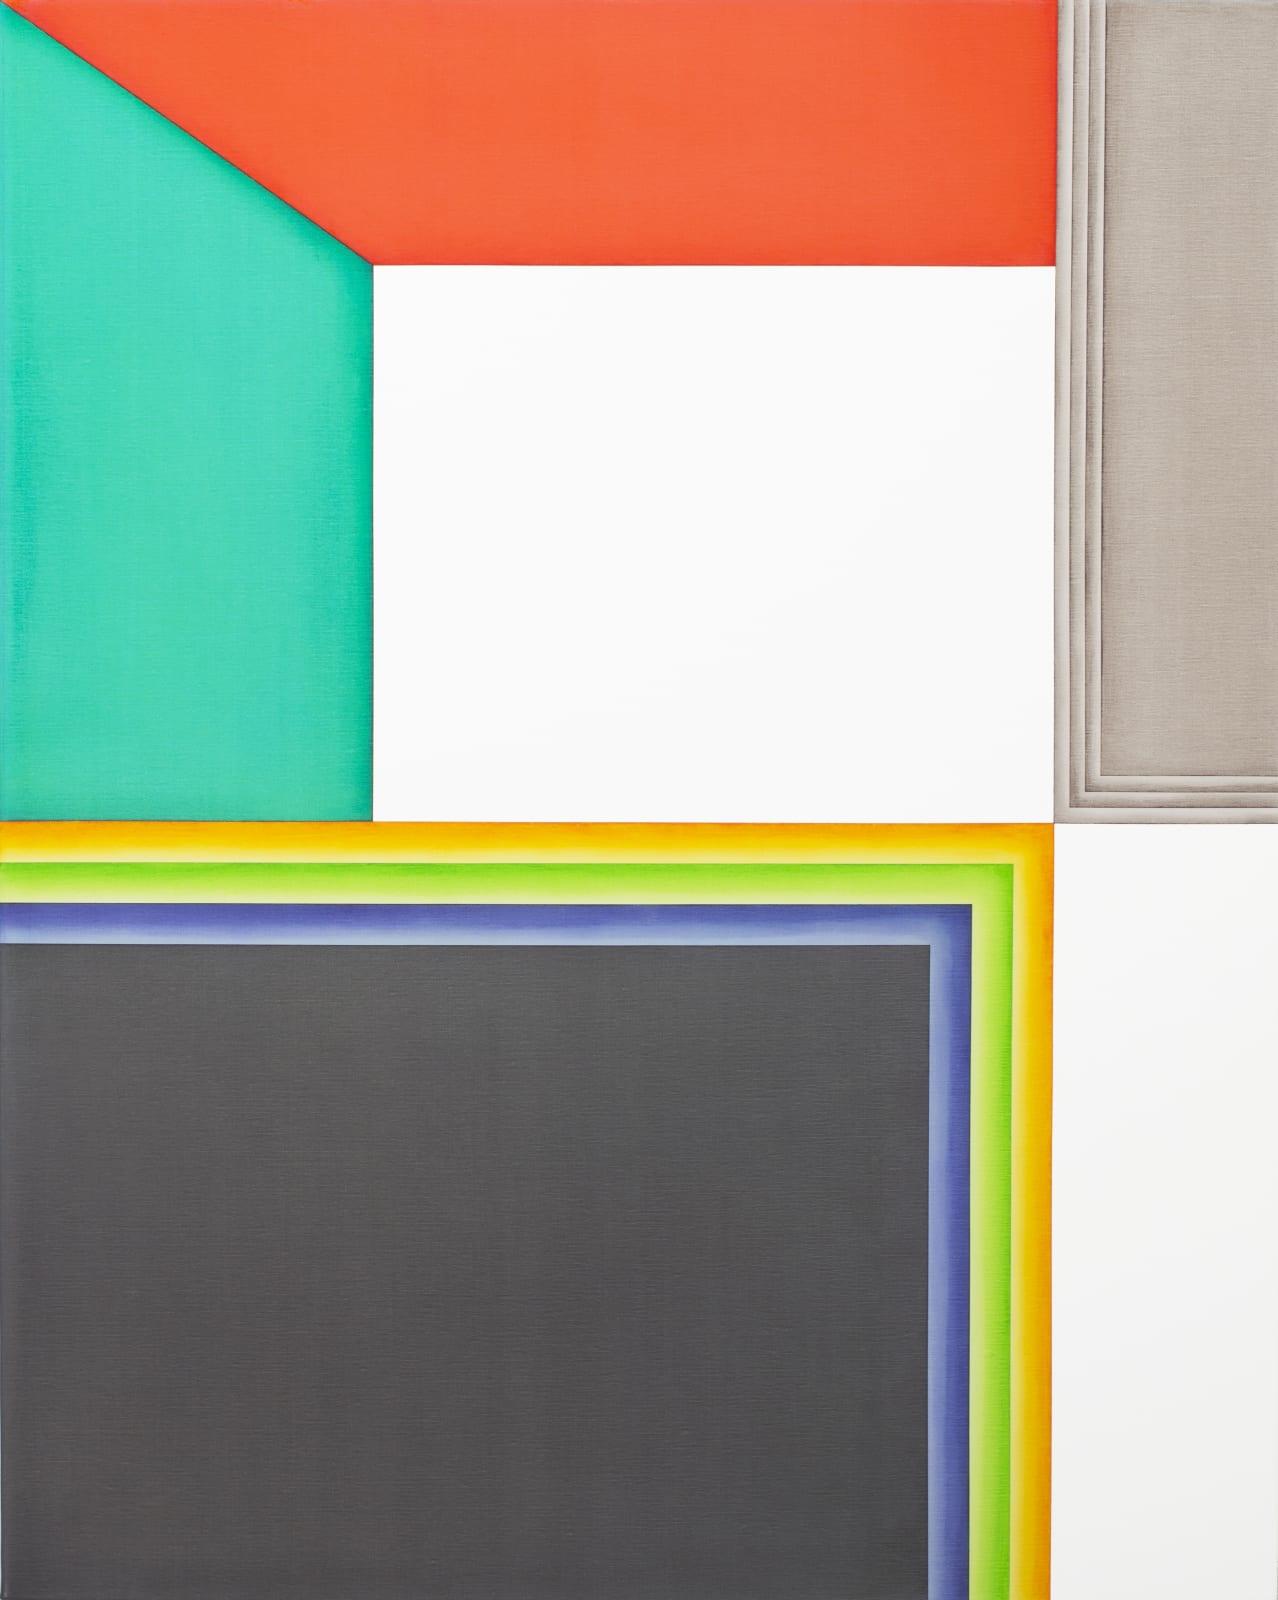 Selma Parlour, Eftsoons III, 2020, 76.2 x 60.96 cm